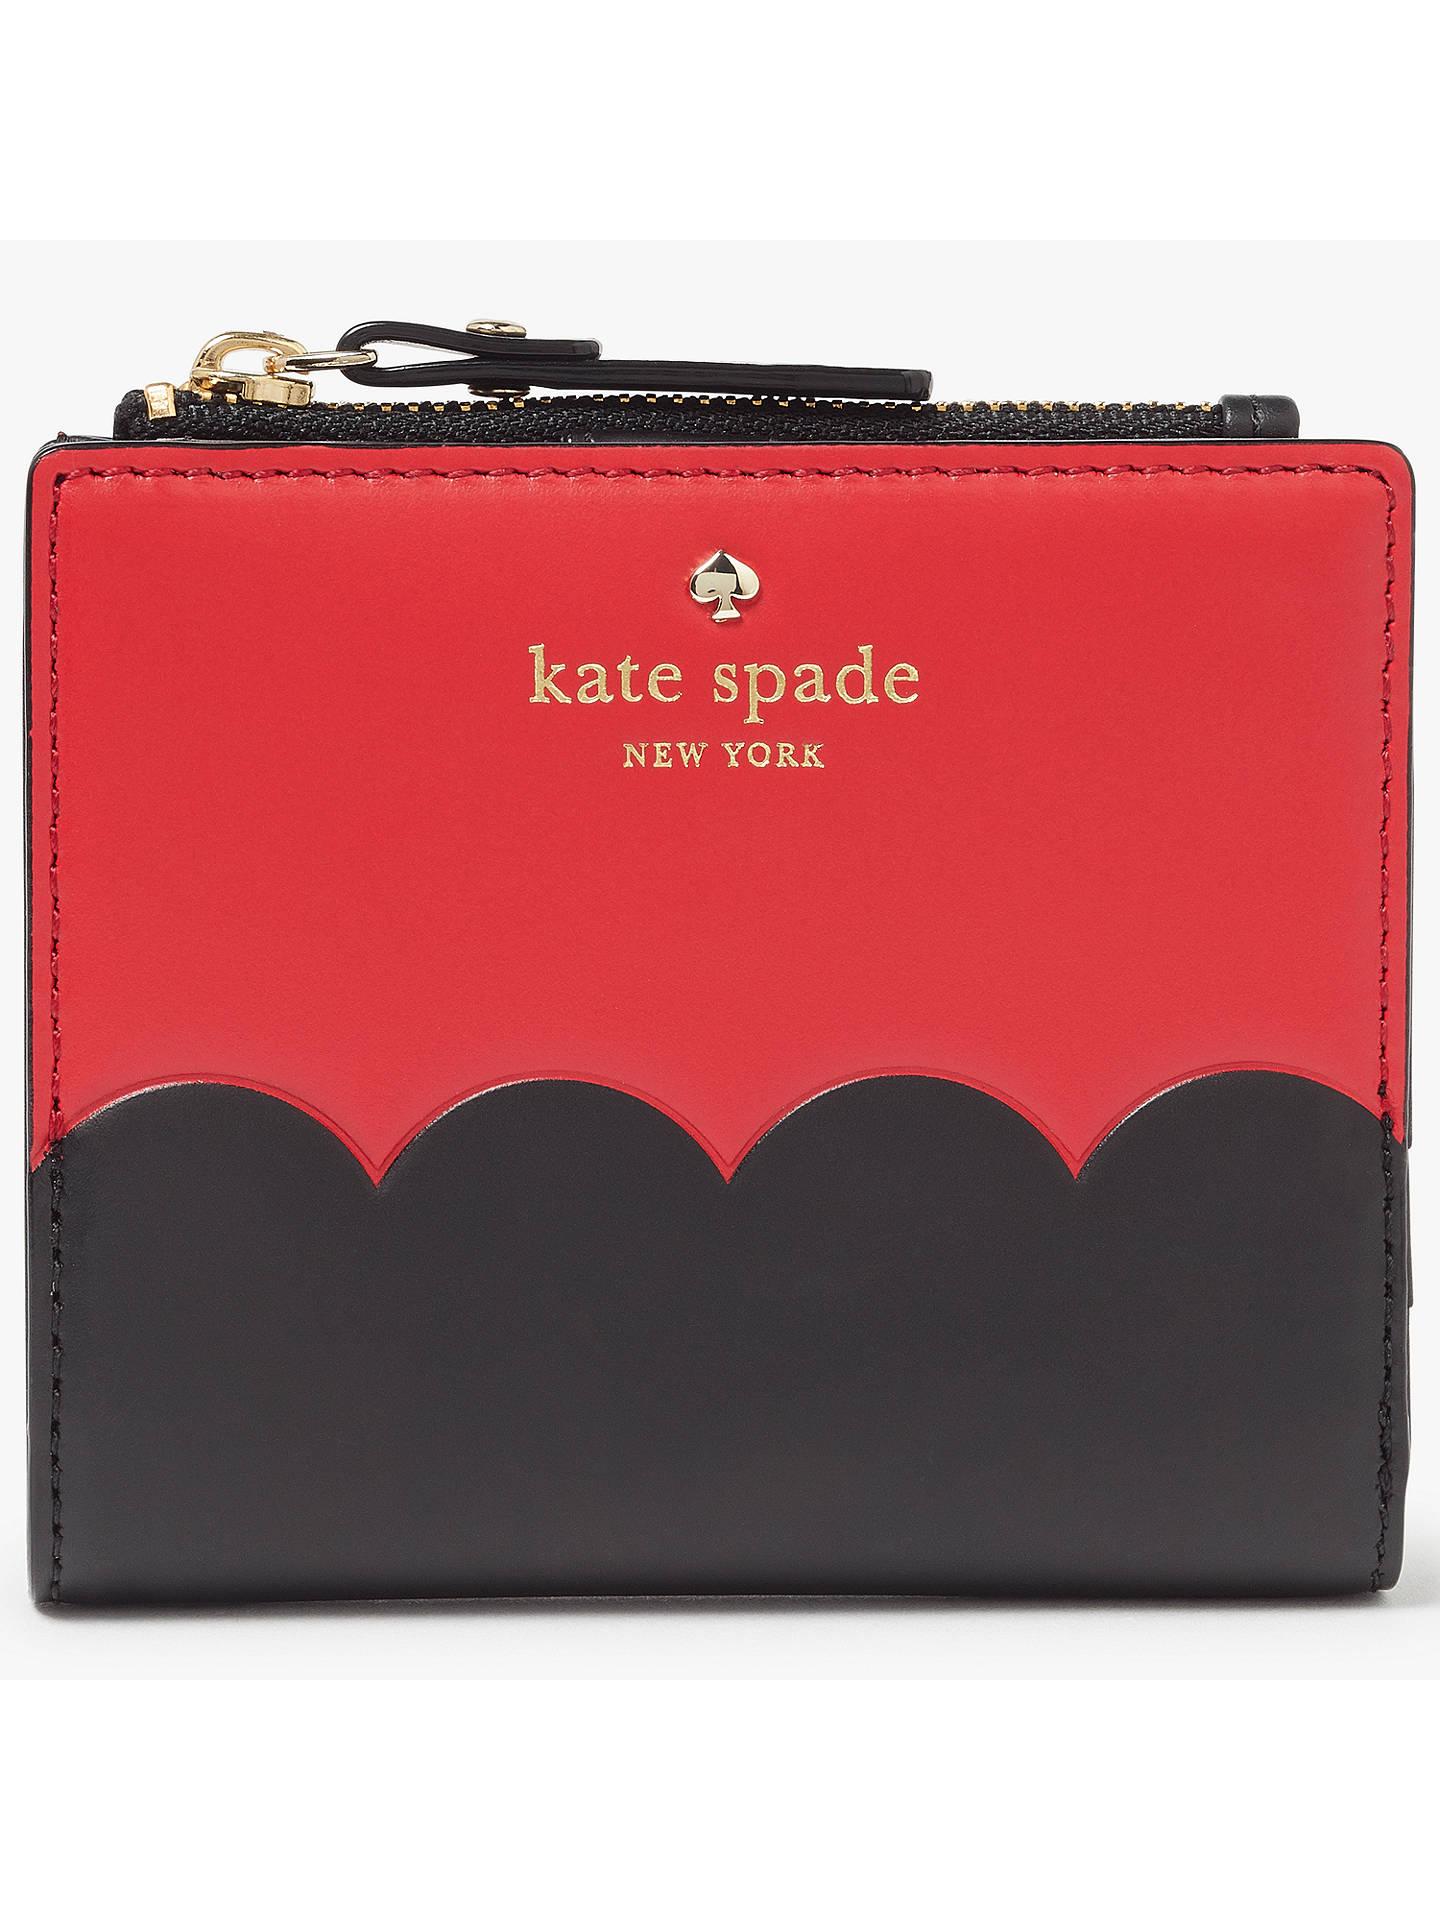 672ece30a7ef2 Buy kate spade new york Cameron Street Adalyn Leather Purse